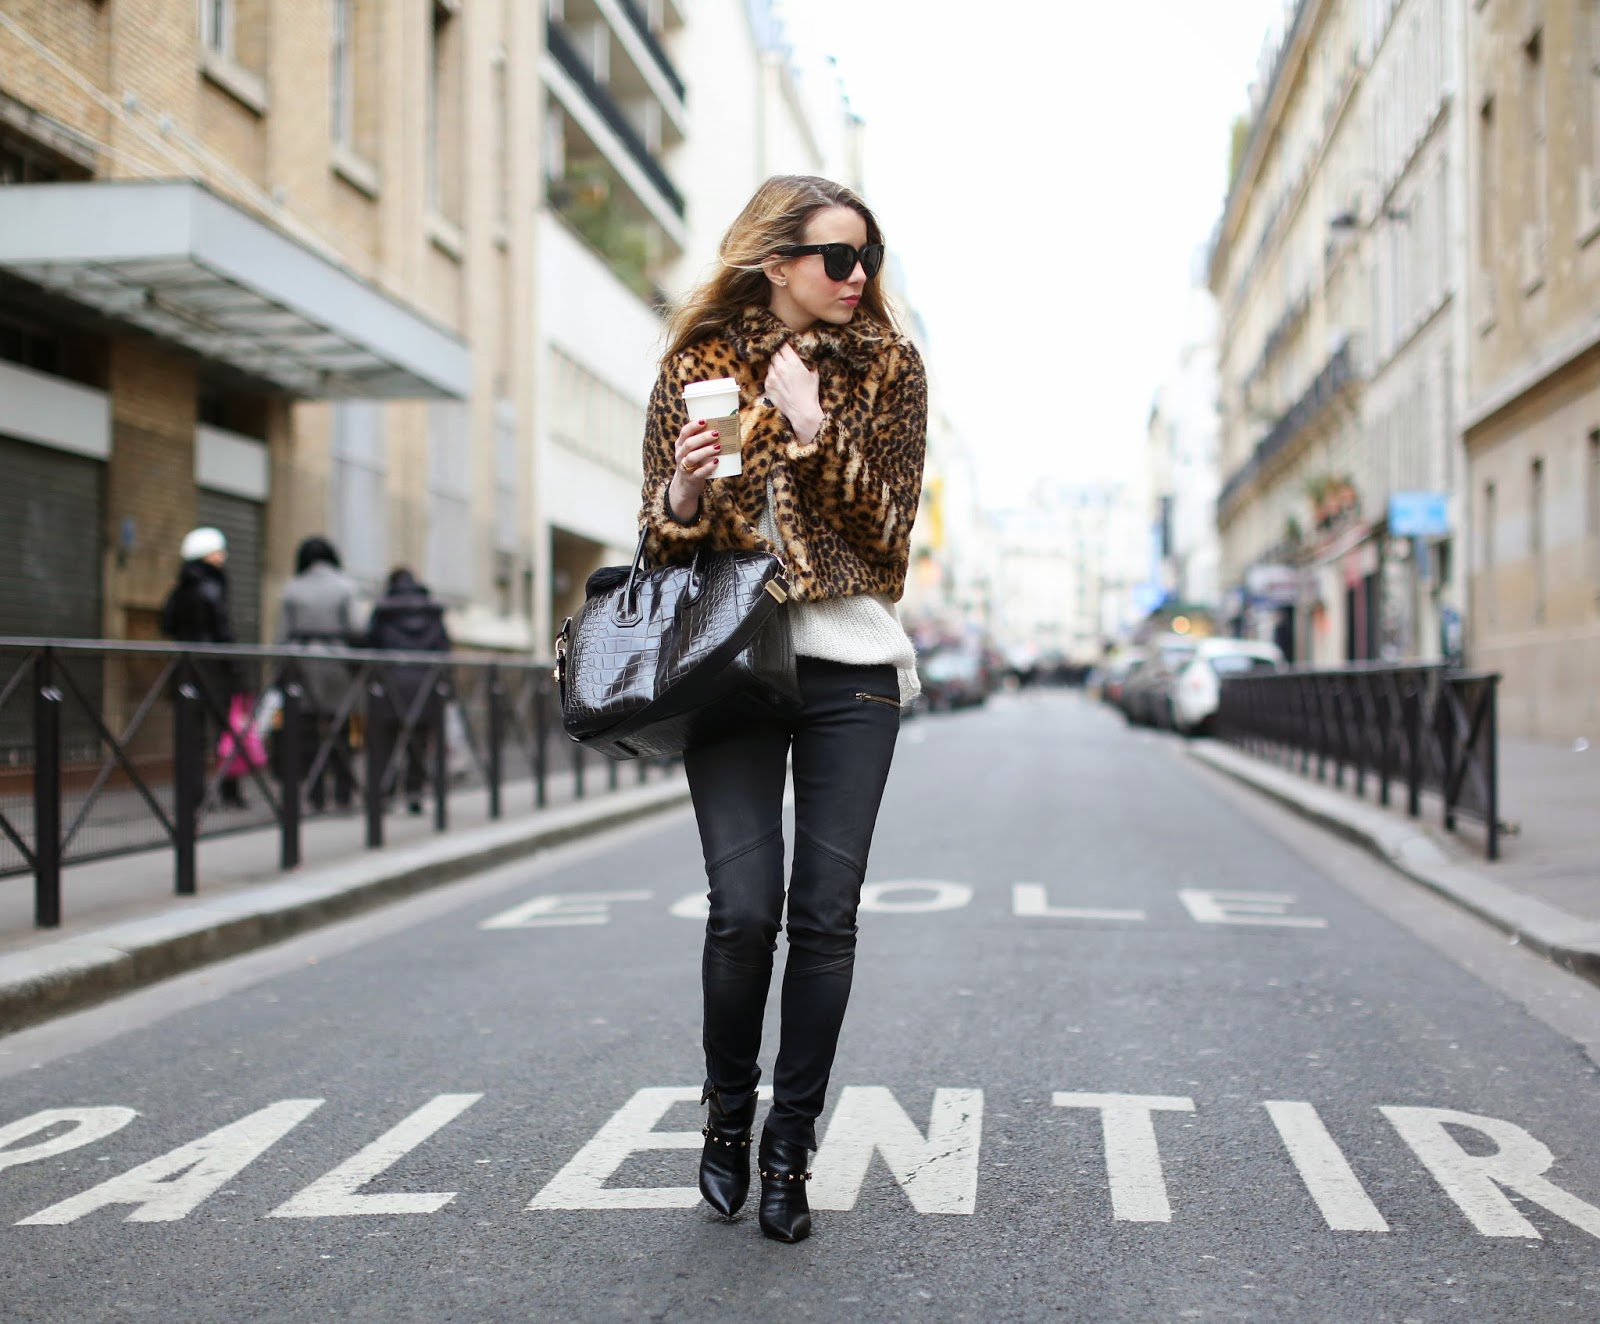 leopard, zara, faux fur, superfine, valentino, givenchy, streetstyle, fashion blogger, paris